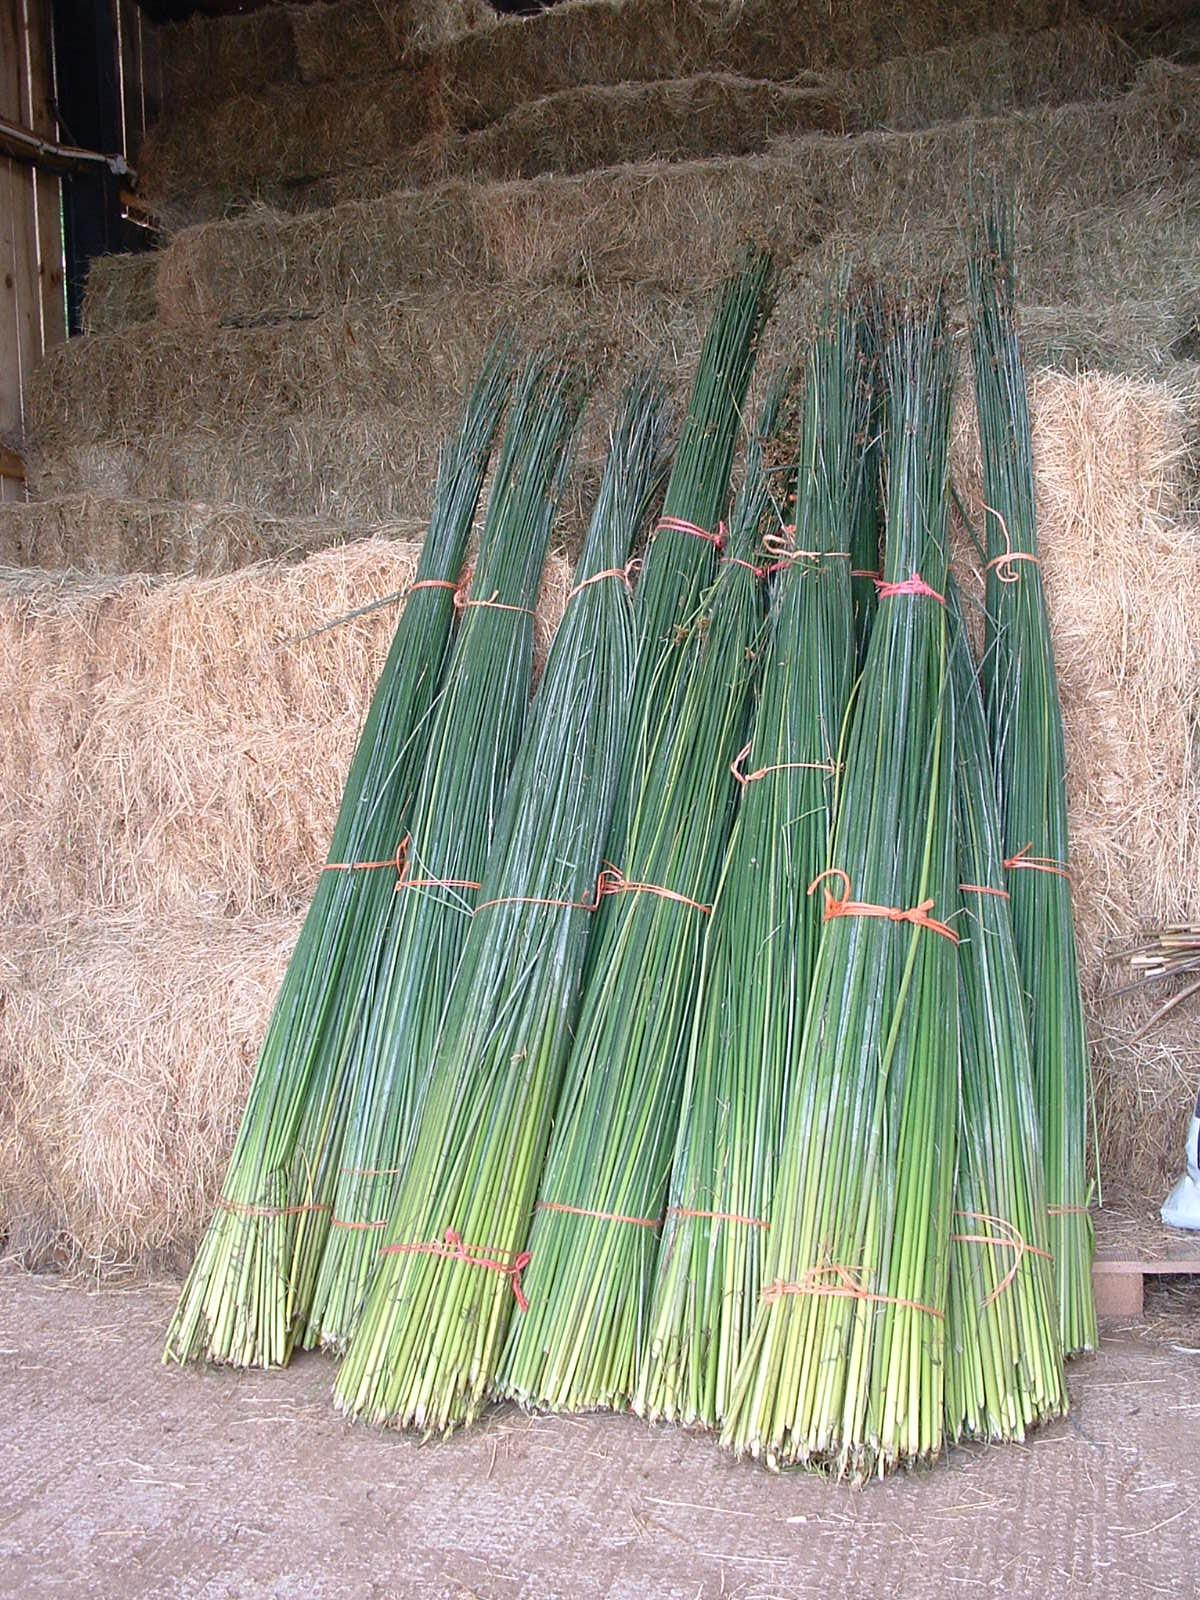 Harvested Rush Bundles